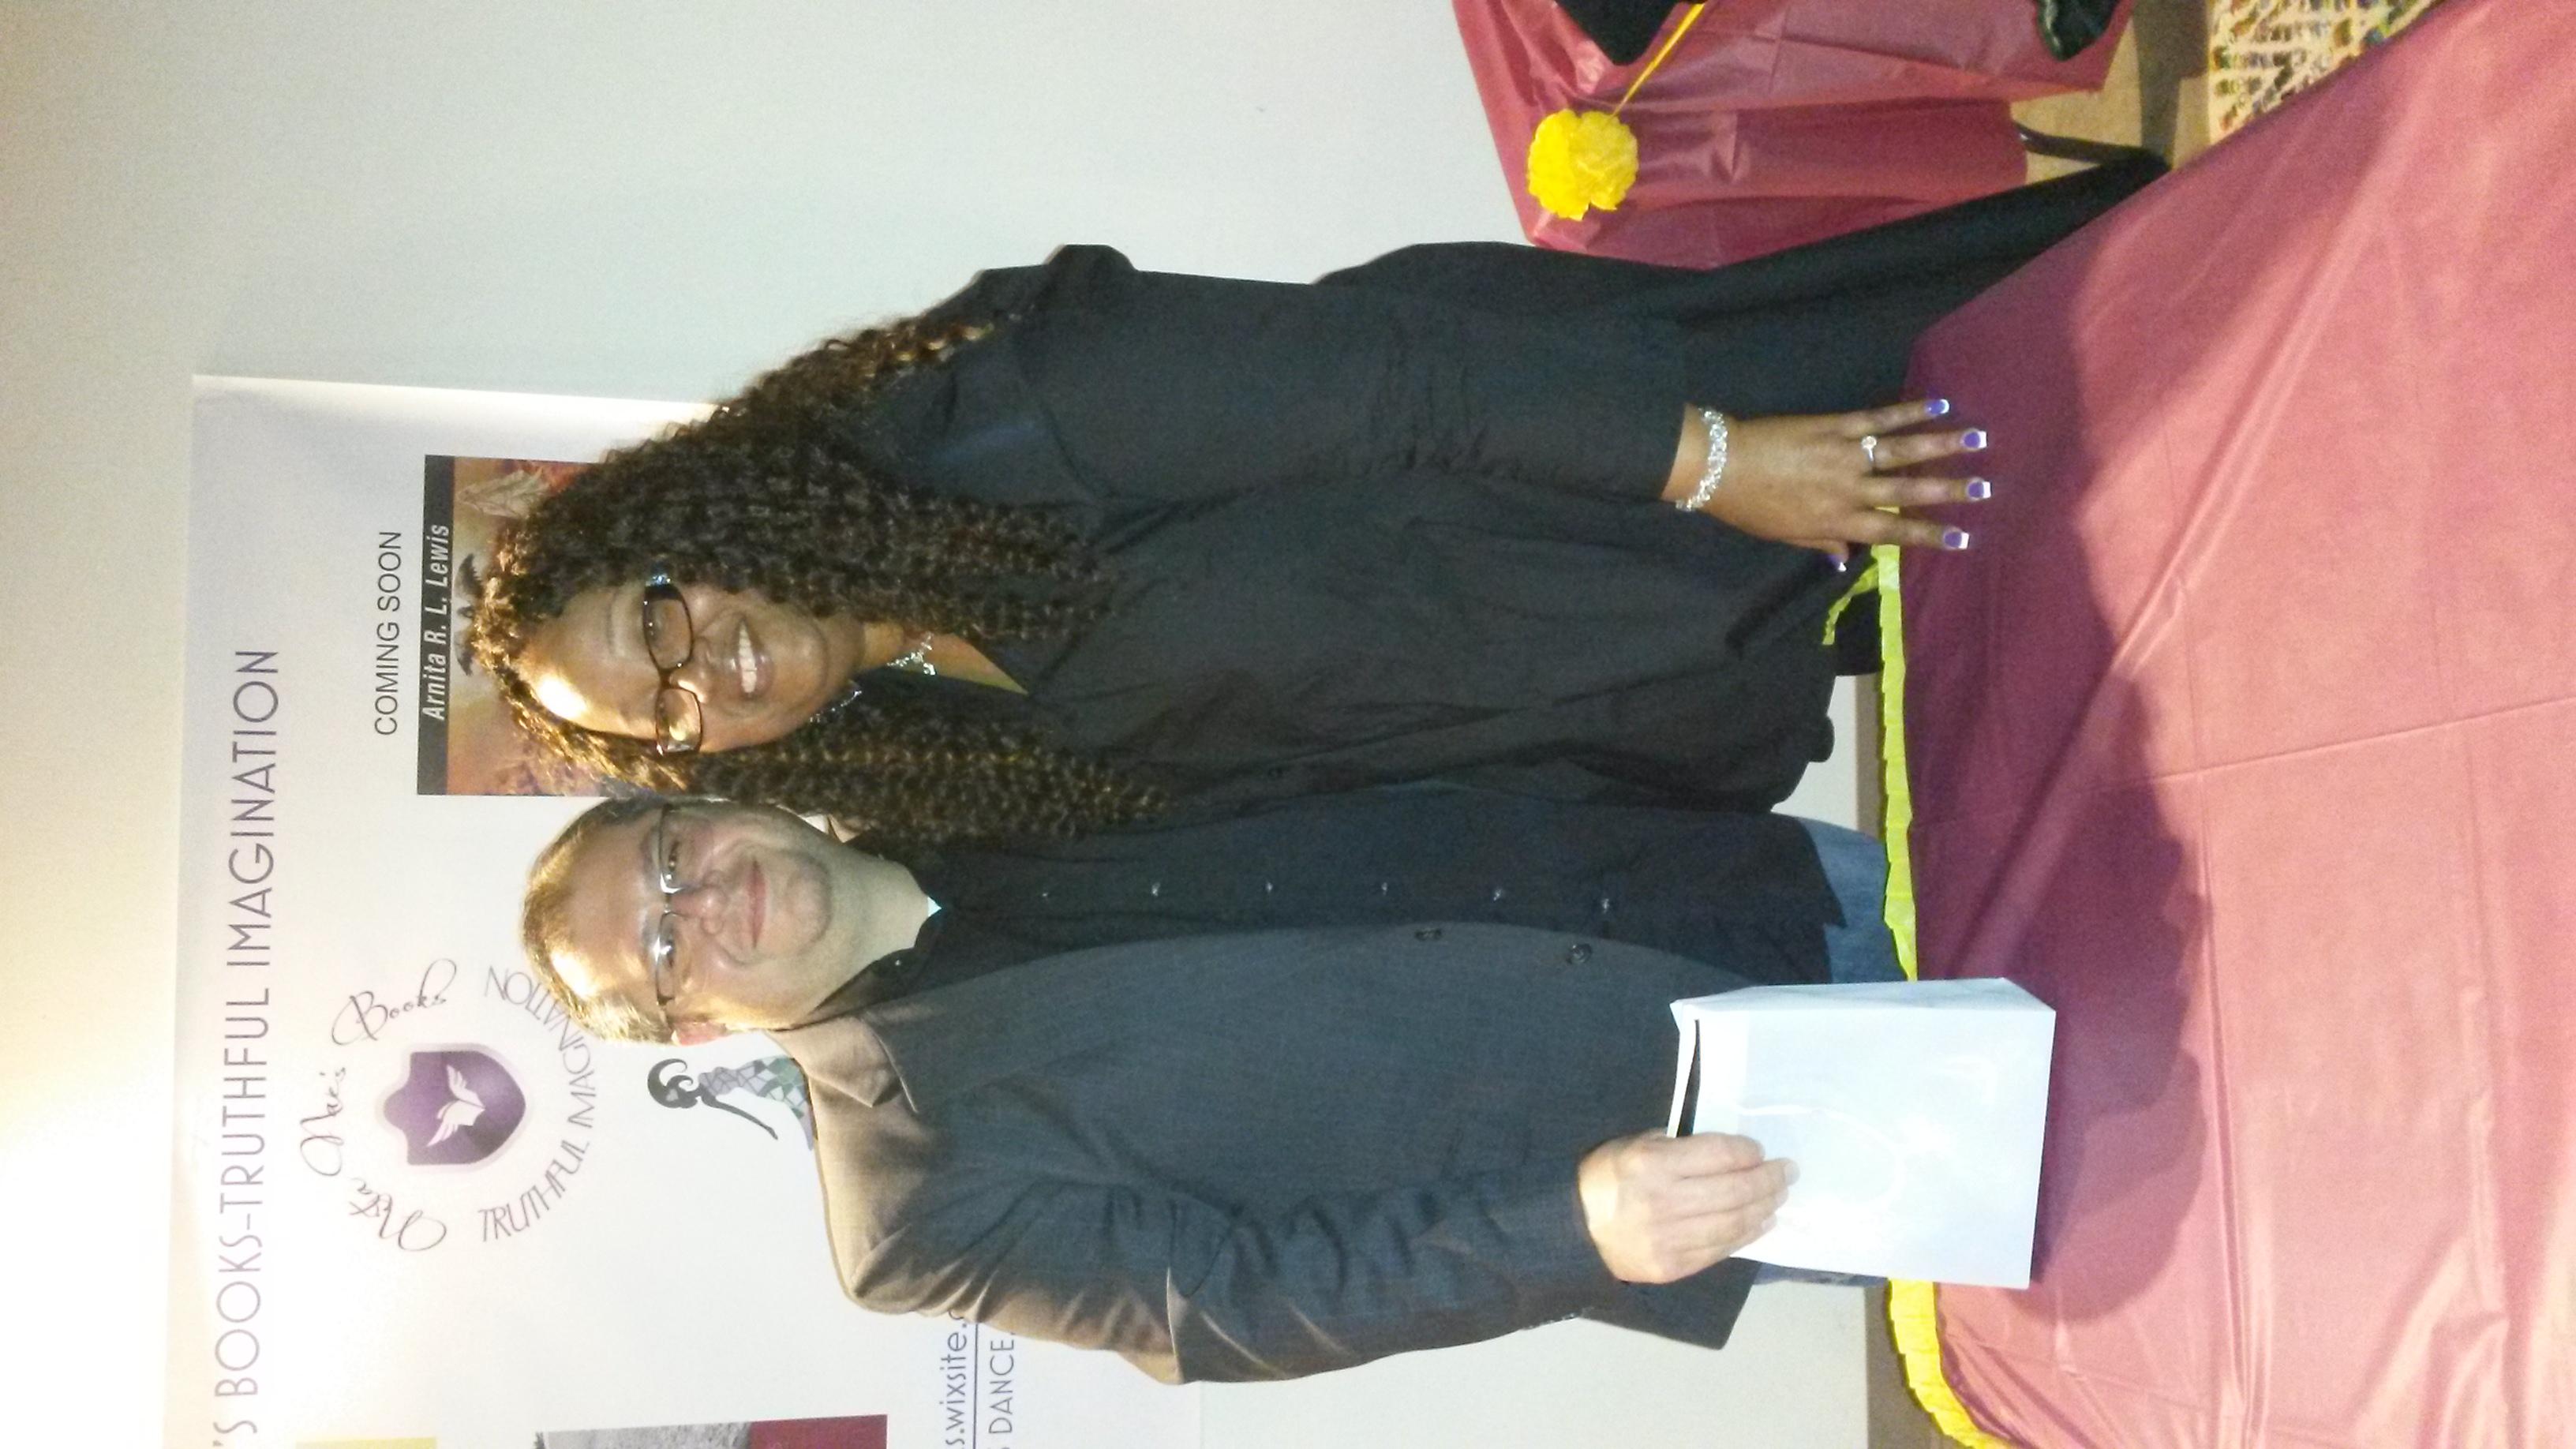 Nita Nae & Jonathan M